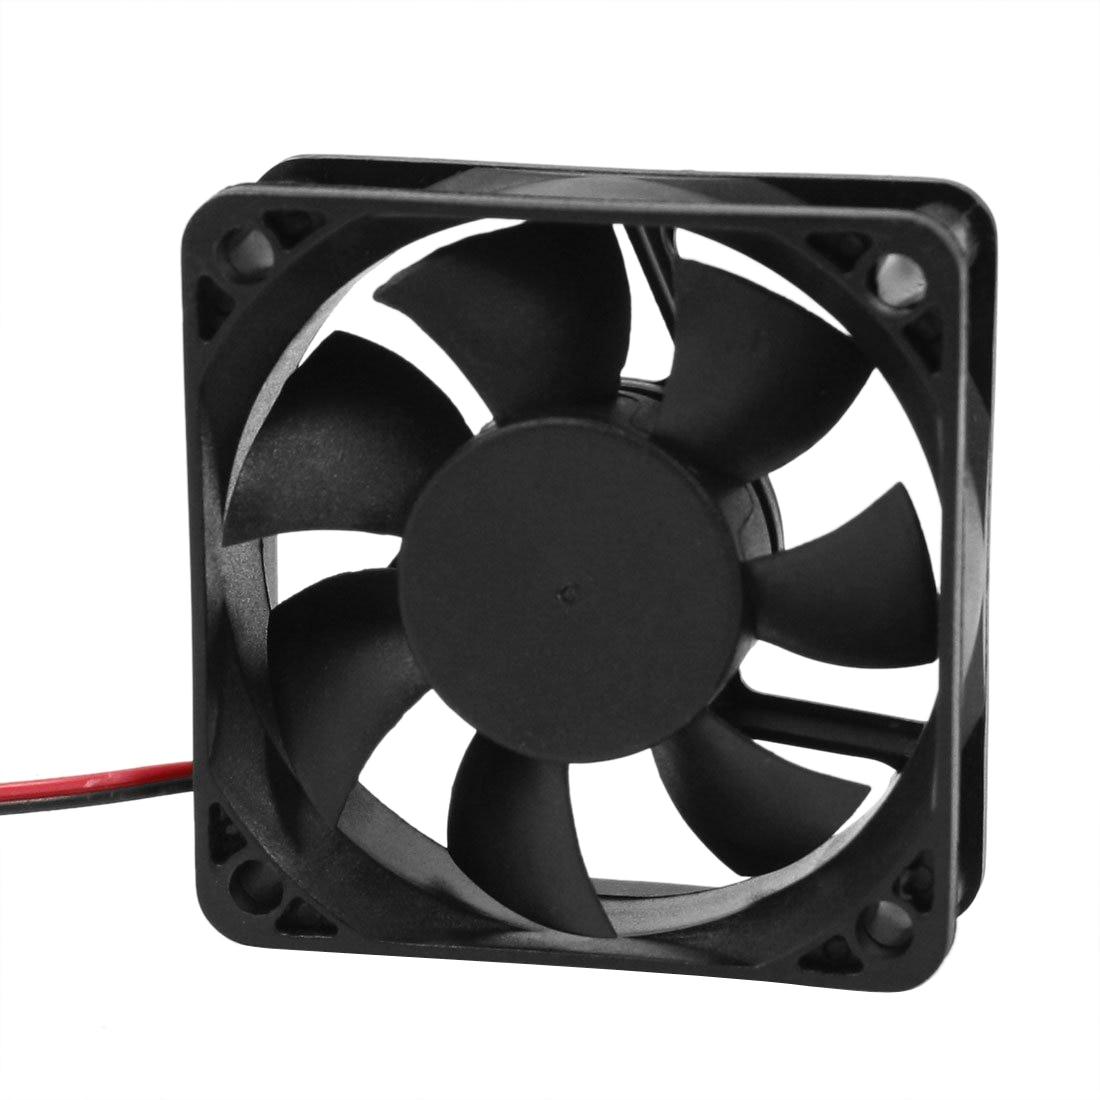 GTFS-Hot Sale DC 12V 2Pins Cooling Fan 60mm x 15mm for PC Computer Case CPU Cooler aerocool 15 blade 1 56w mute model computer cpu cooling fan black 12 x 12cm 7v